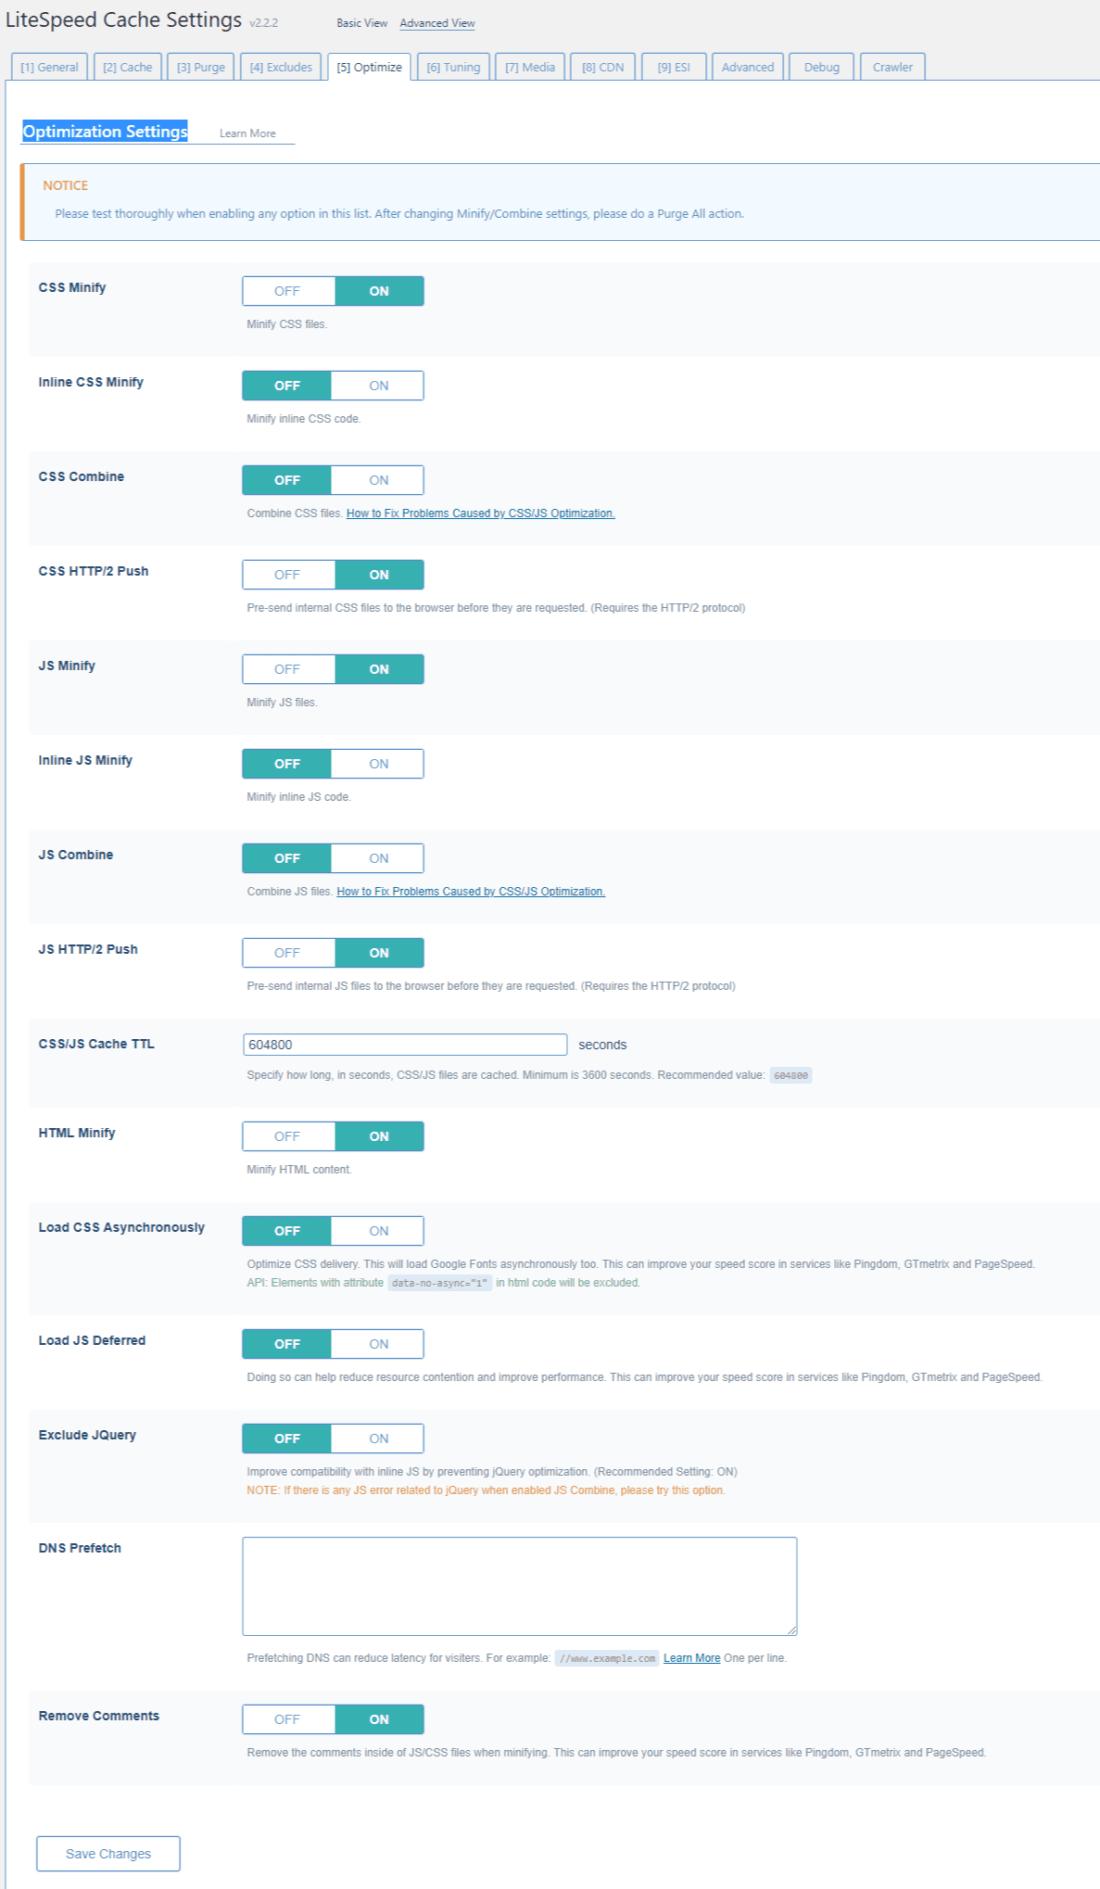 LiteSpeed Cache Optimization Settings